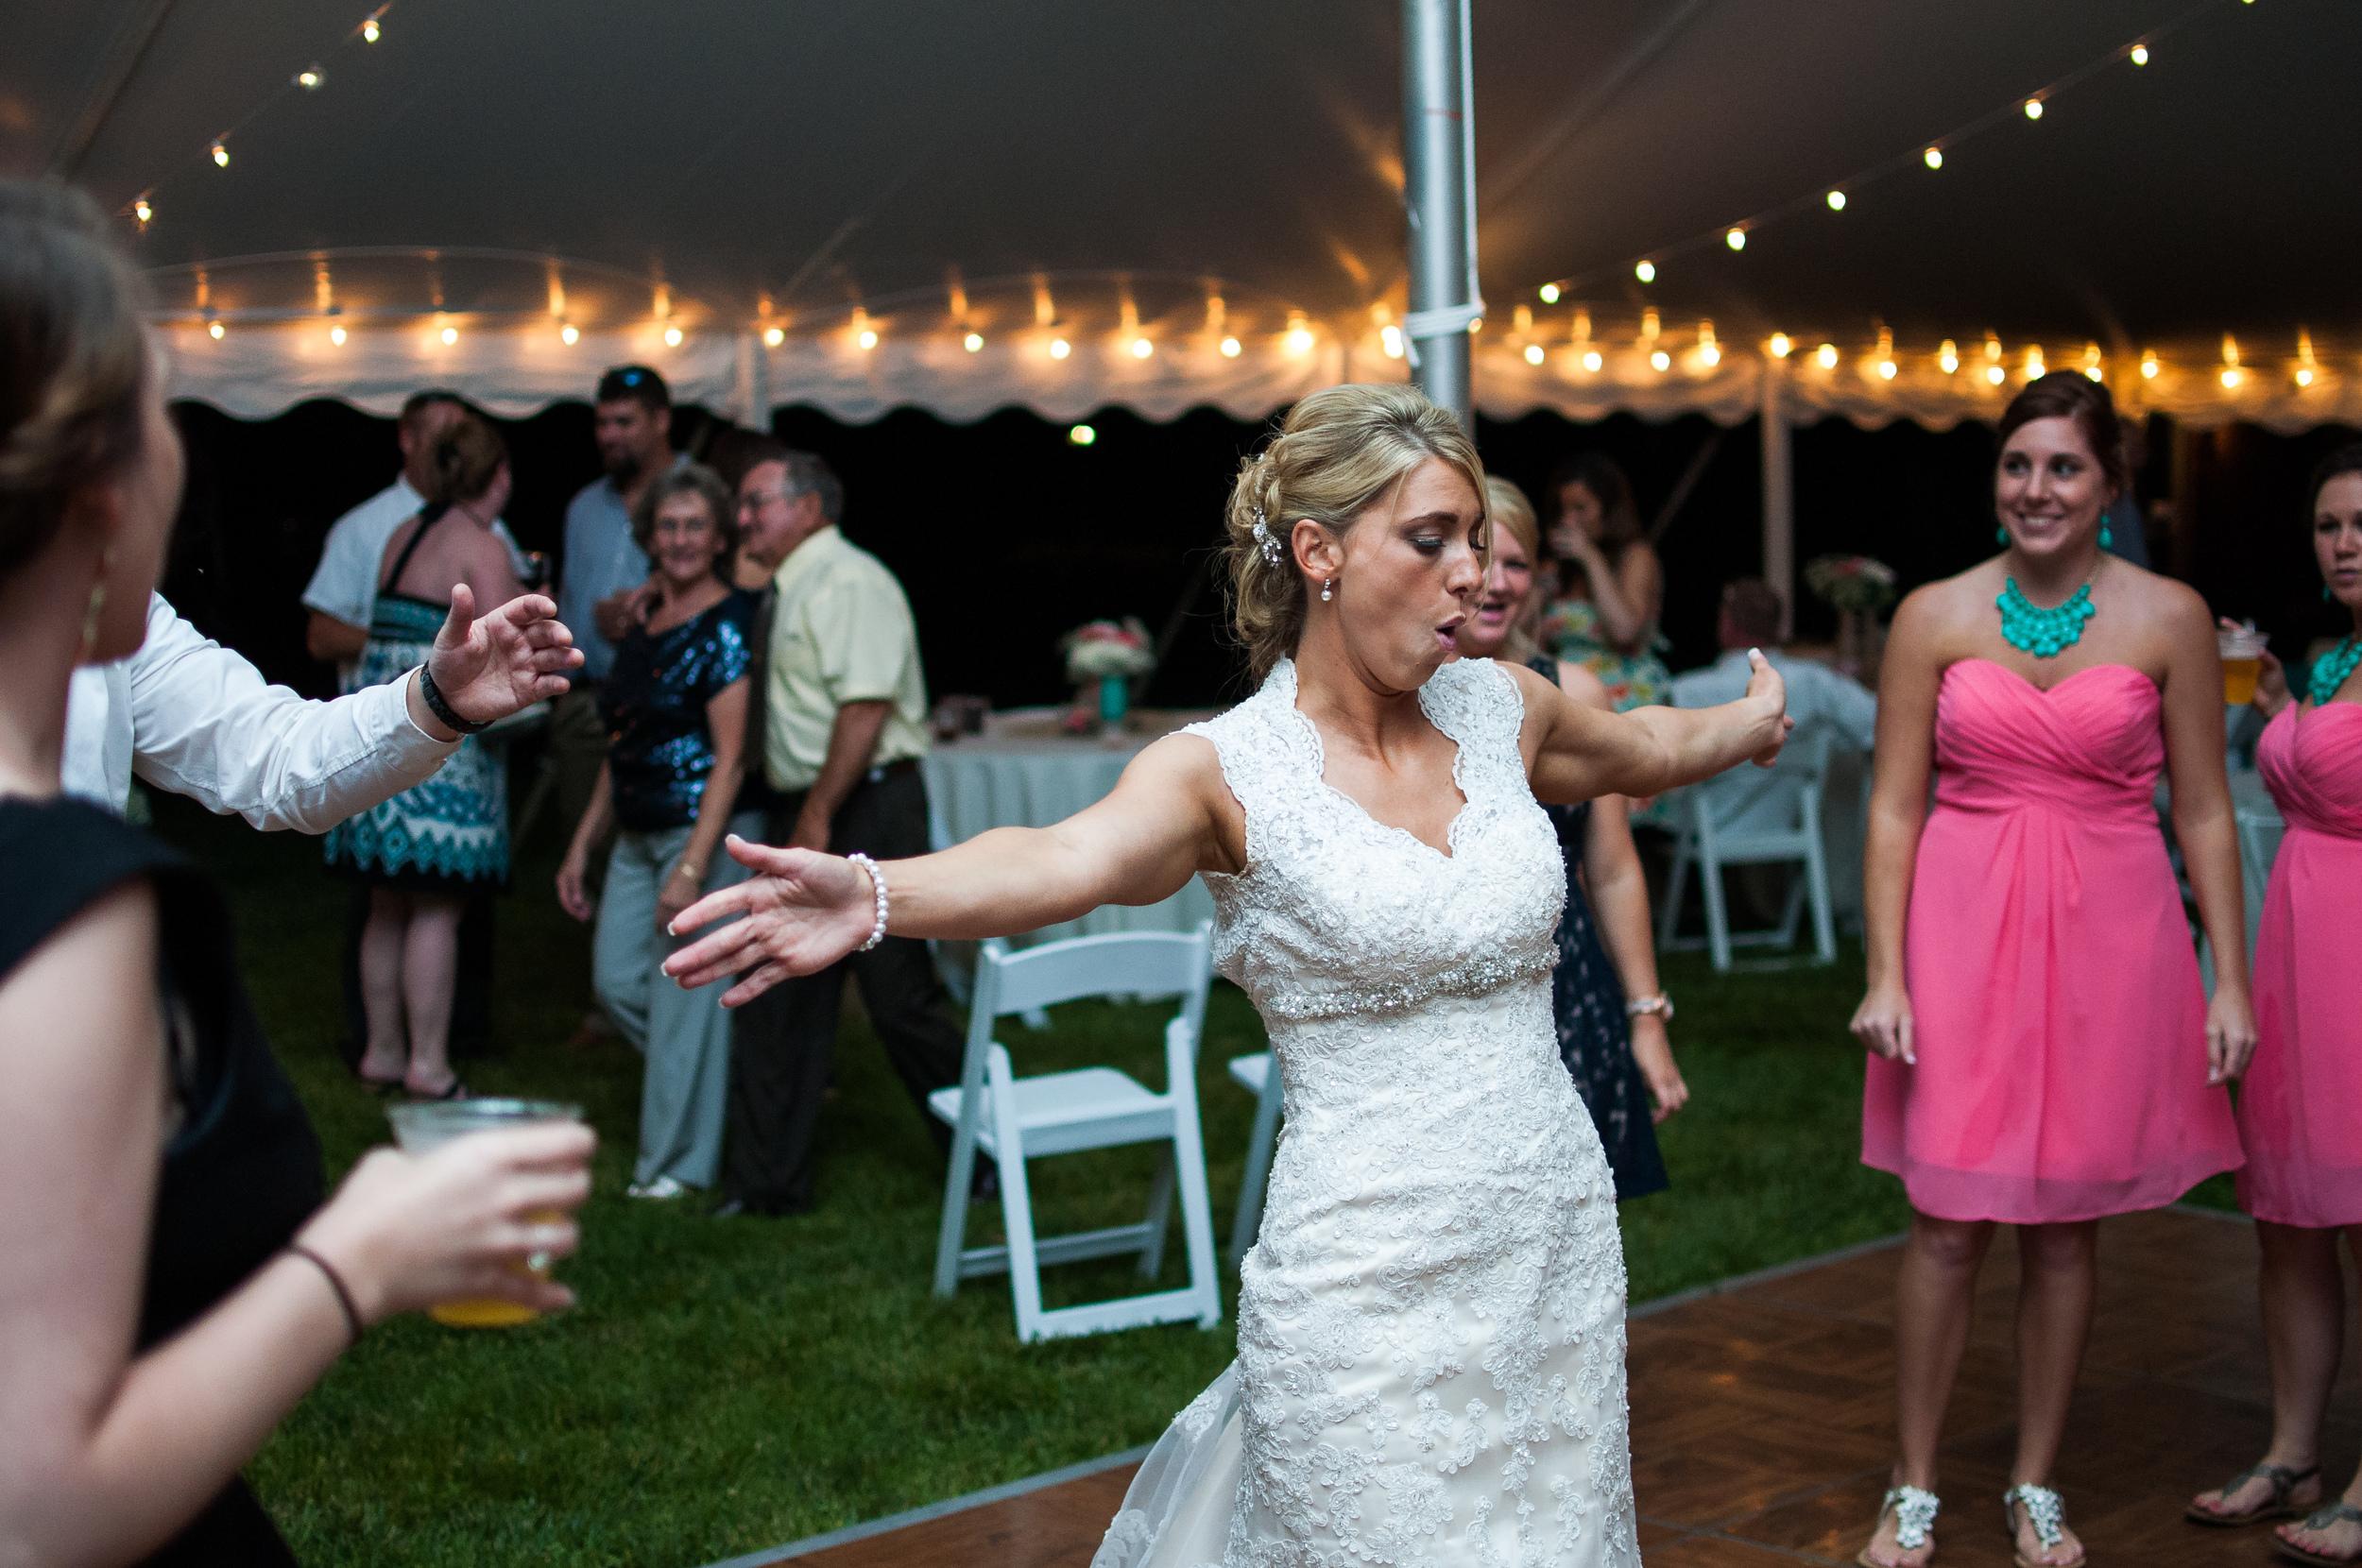 140614 - Julie and Hunter's Wedding-315.jpg